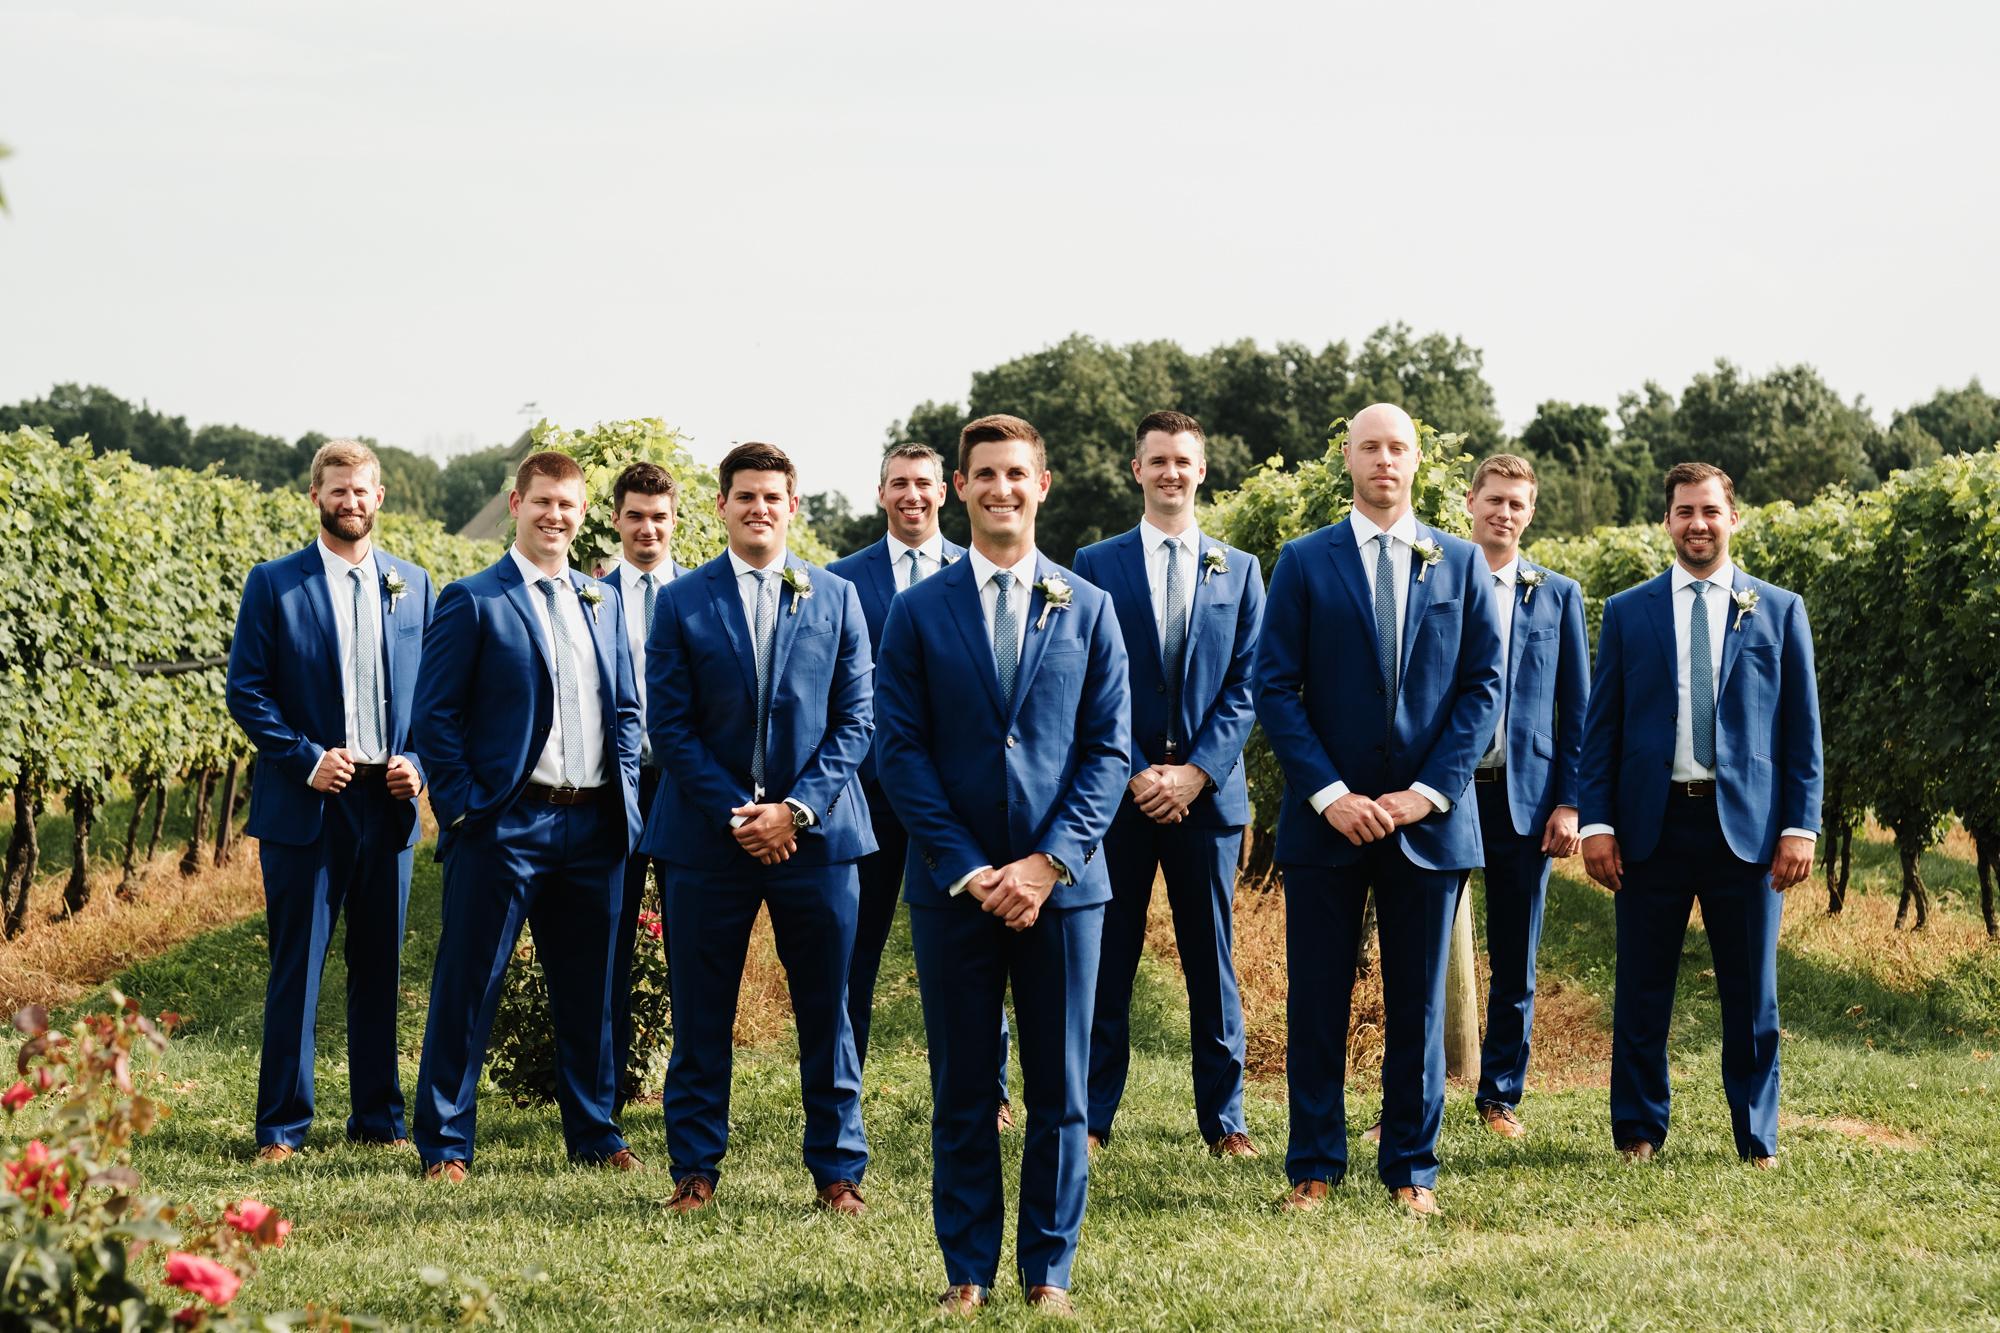 Wedding_Francis_Boucher_Jonathan_Edwards_Winery_2018-41.jpg